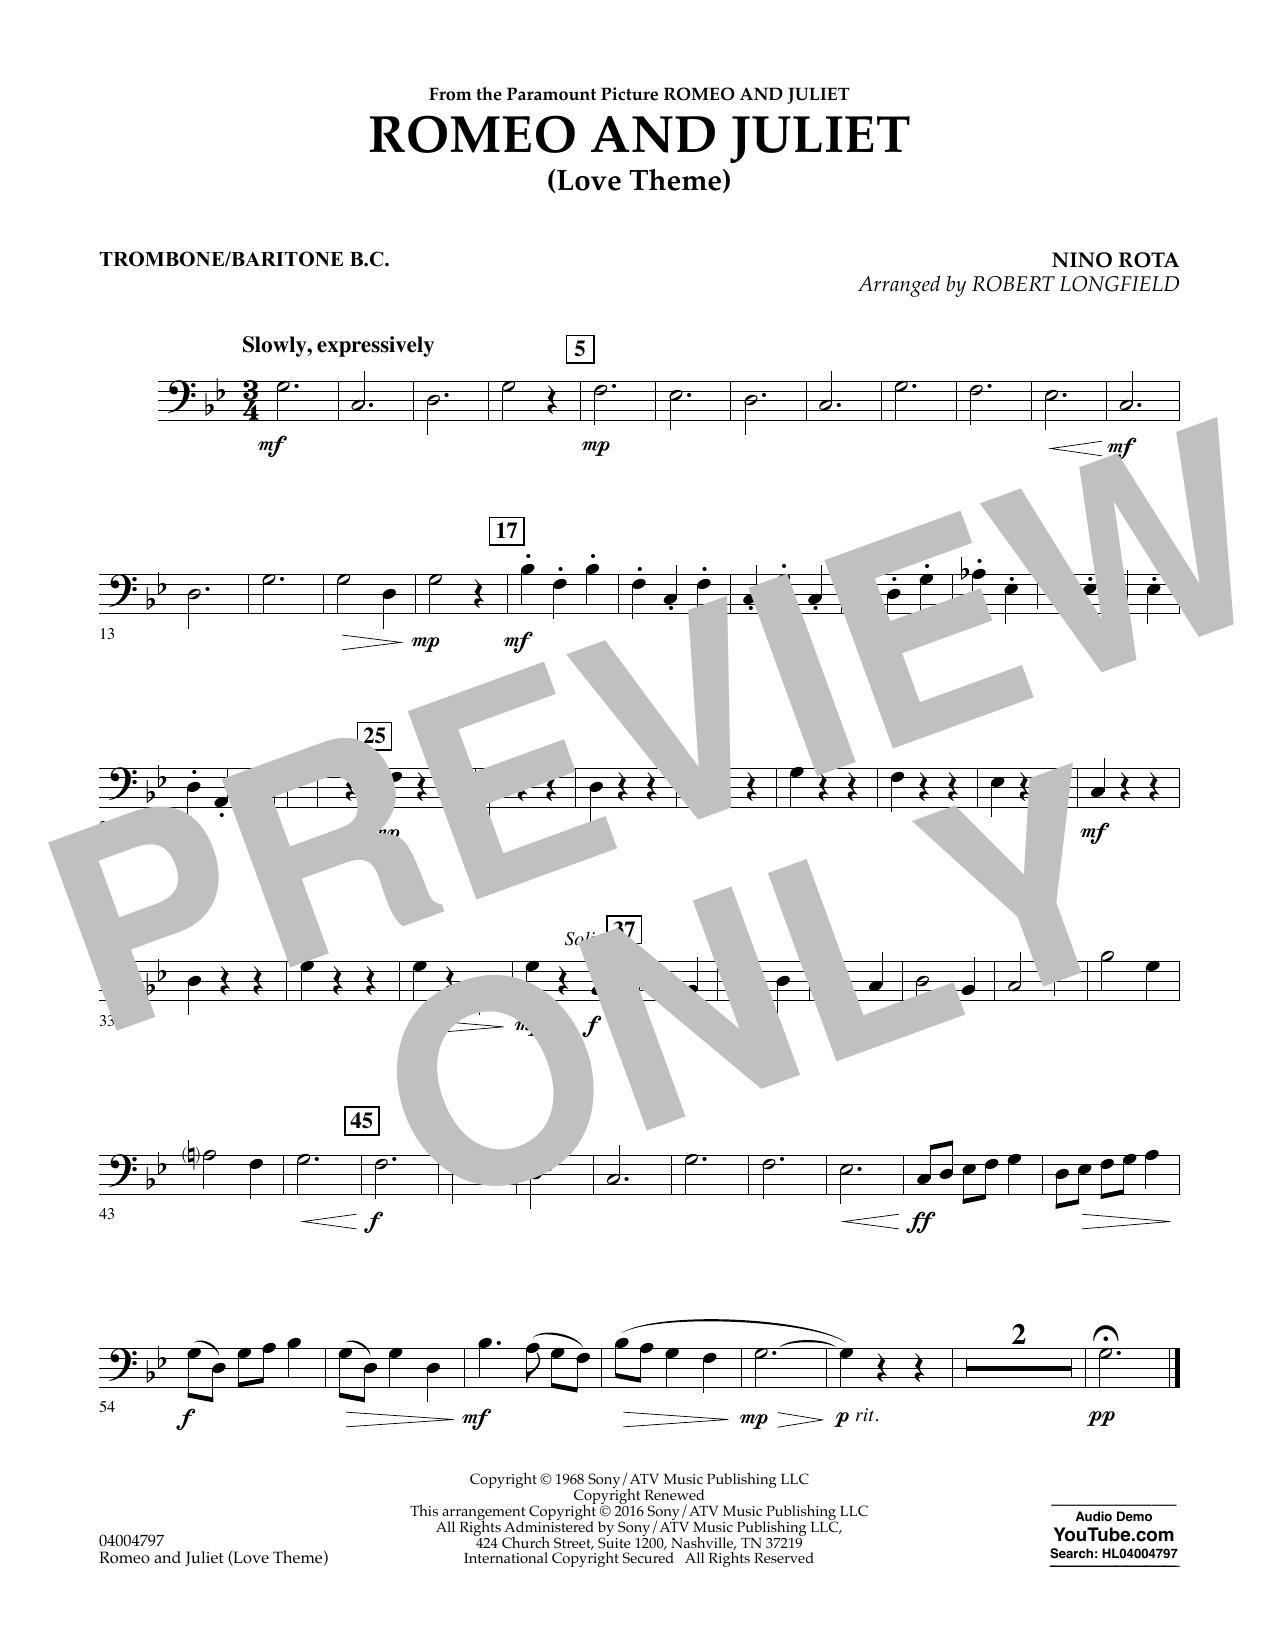 Romeo and Juliet (Love Theme) - Trombone/Baritone B.C. (Concert Band)